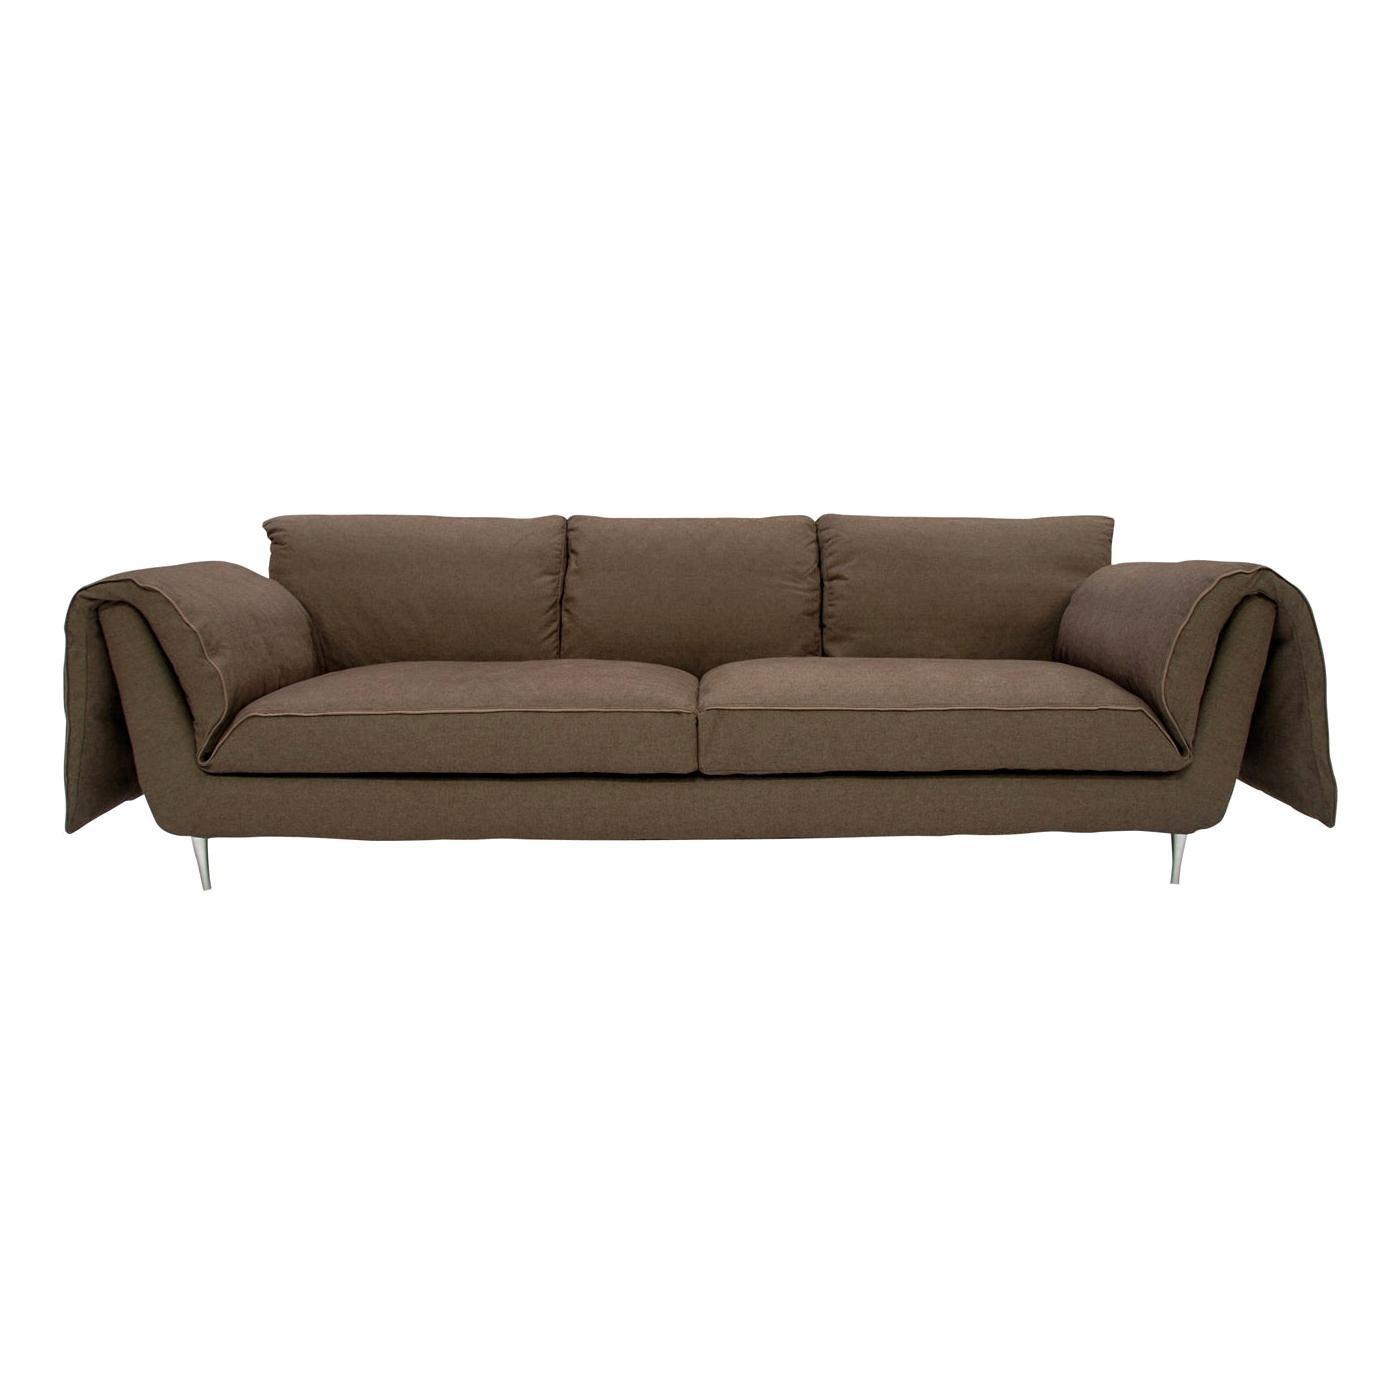 Davenport Sofa By Jonas